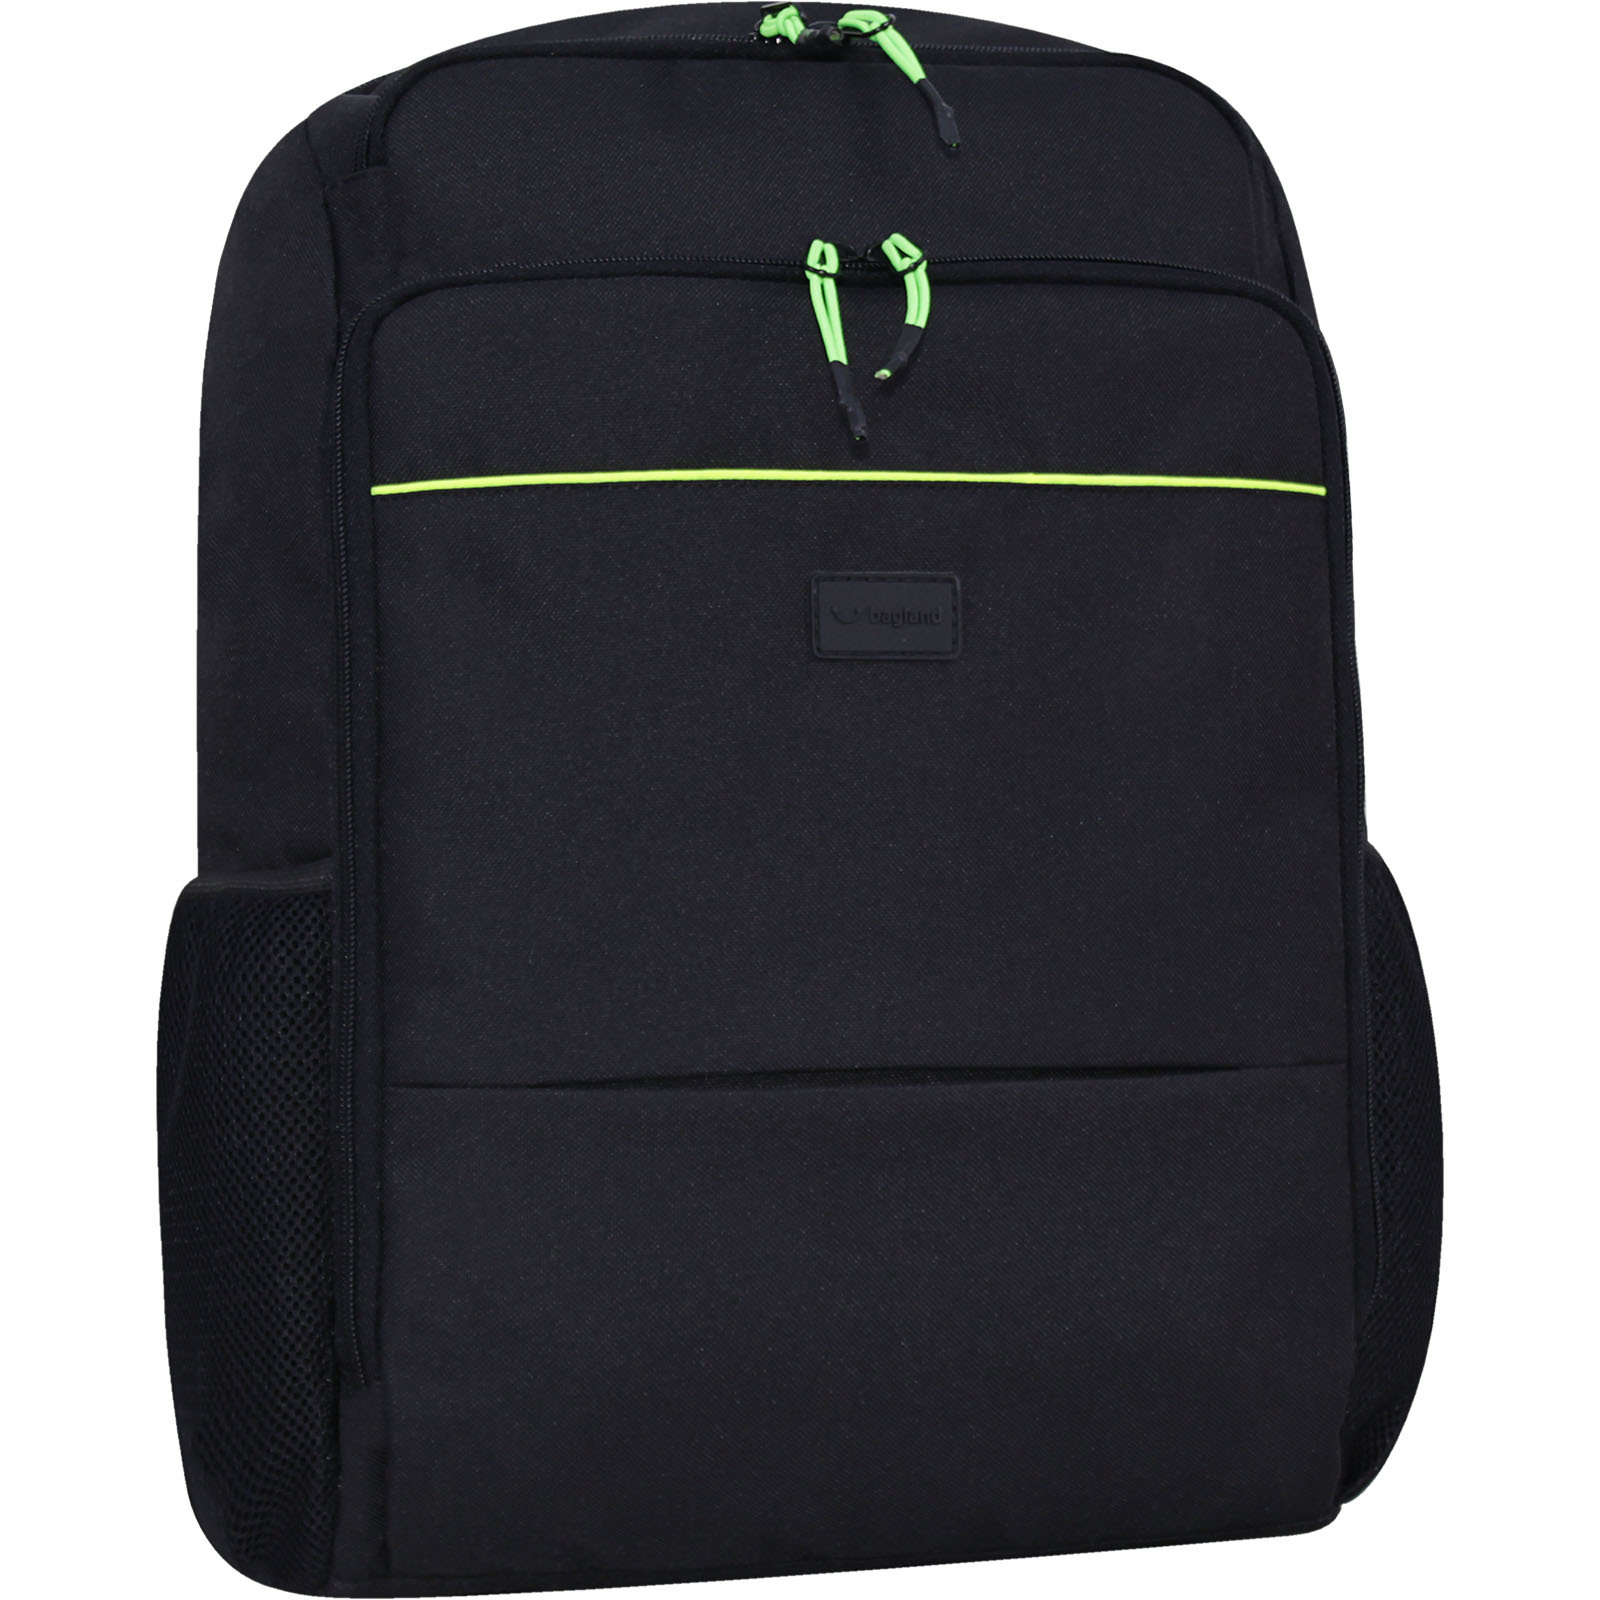 Мужские рюкзаки Рюкзак Bagland Дортмунд 30 л. Чёрный (0016766) IMG_4006-1600.jpg